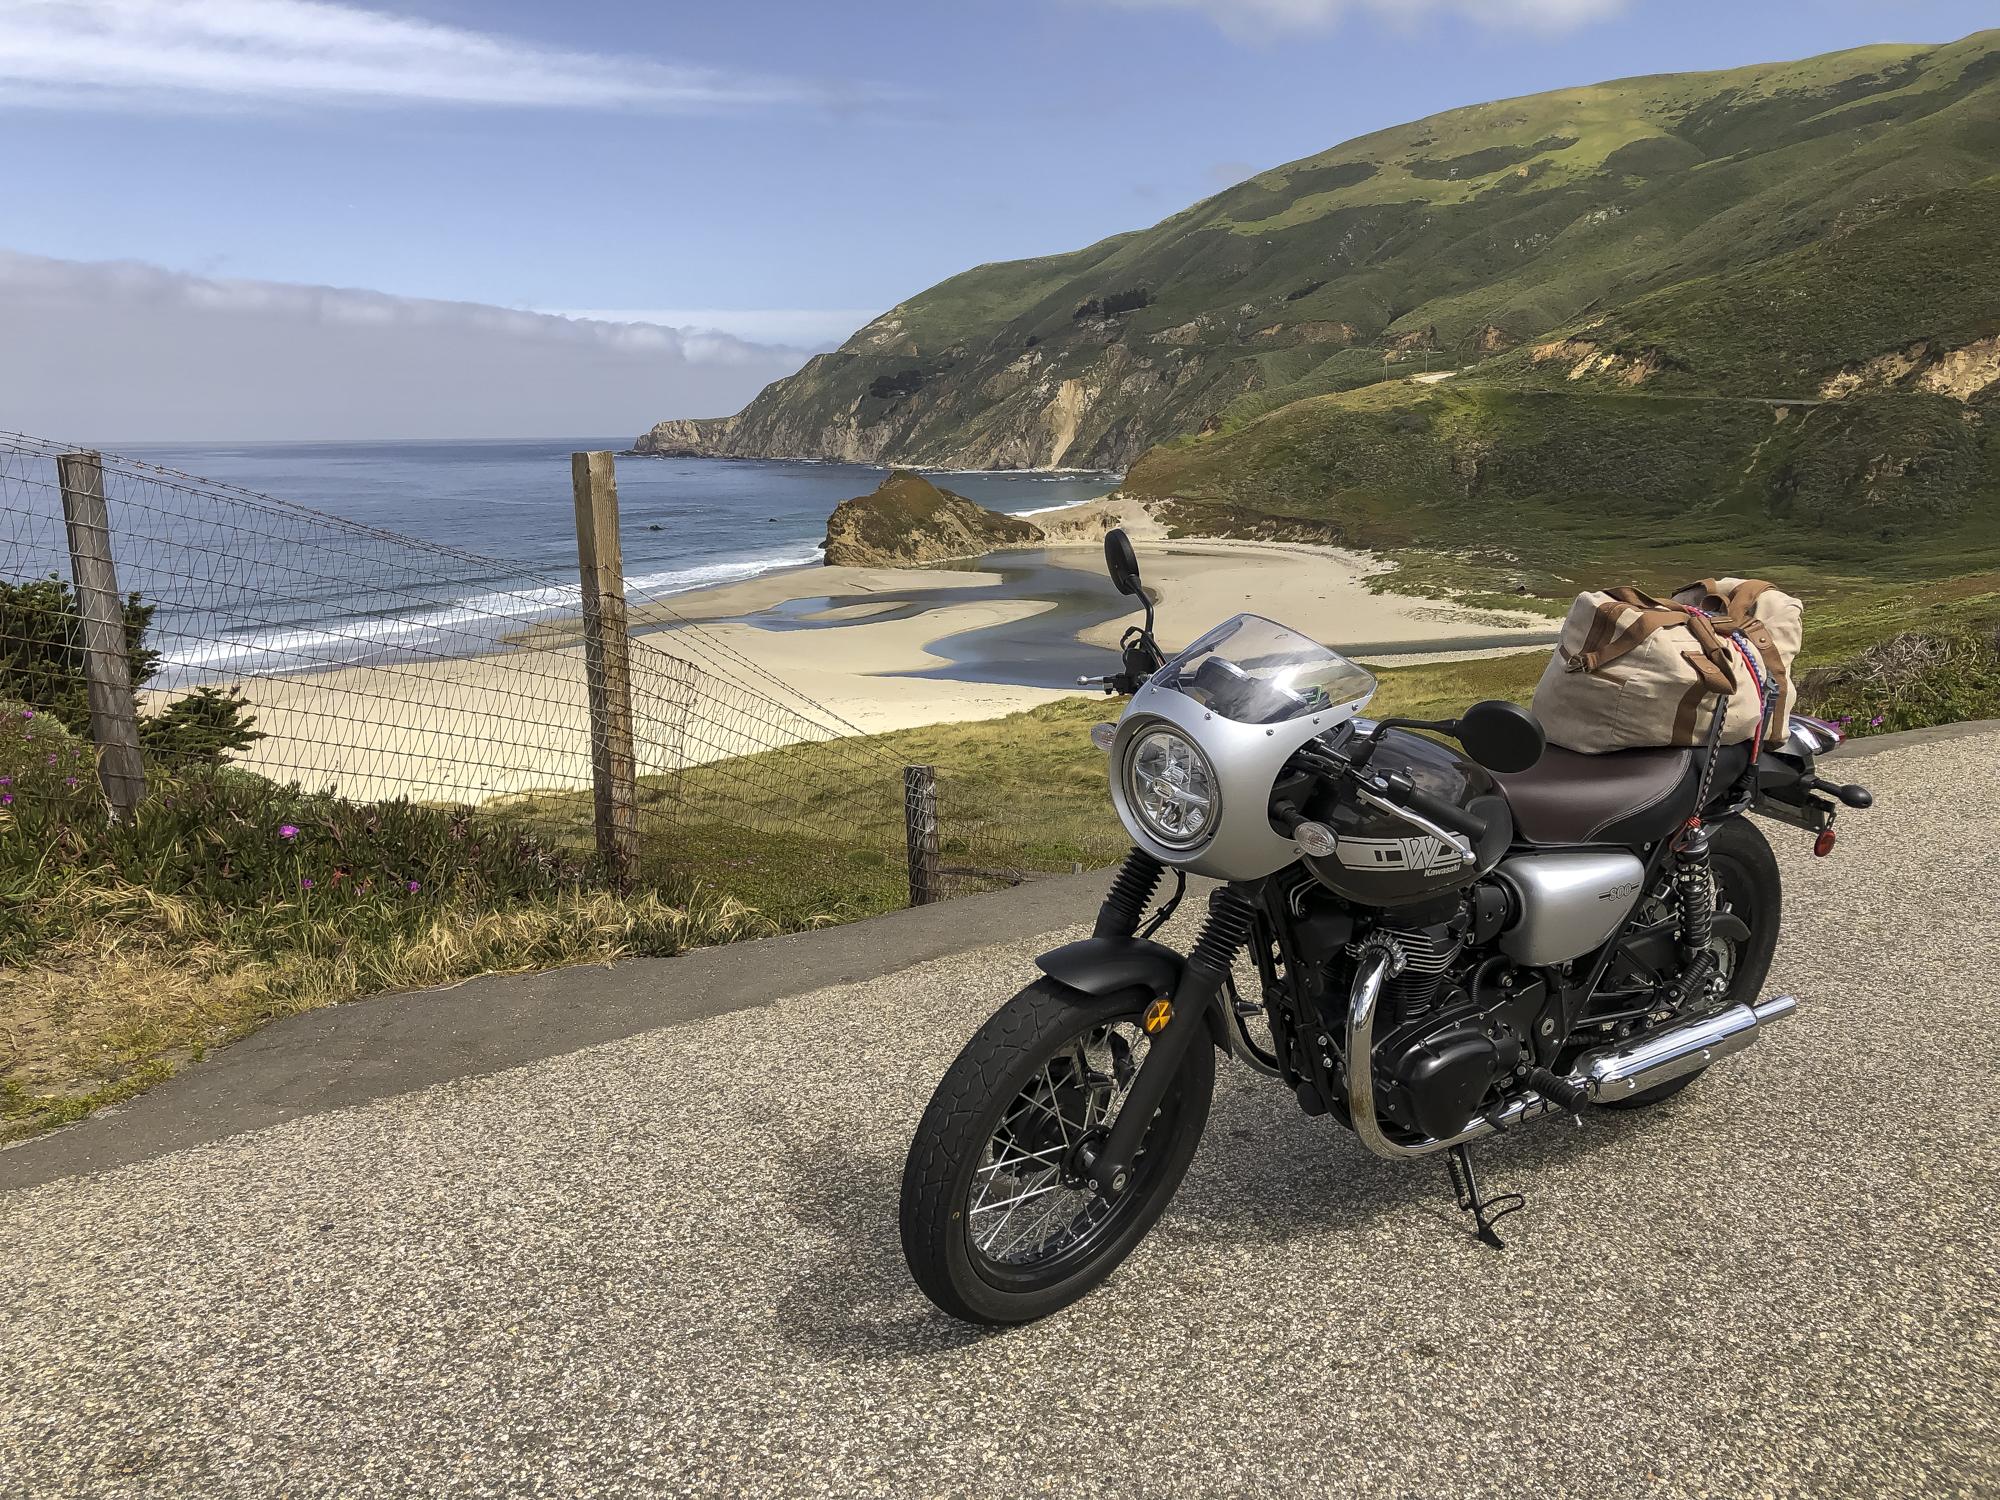 2019 Kawasaki W800 Cafe First Ride Review Revzilla